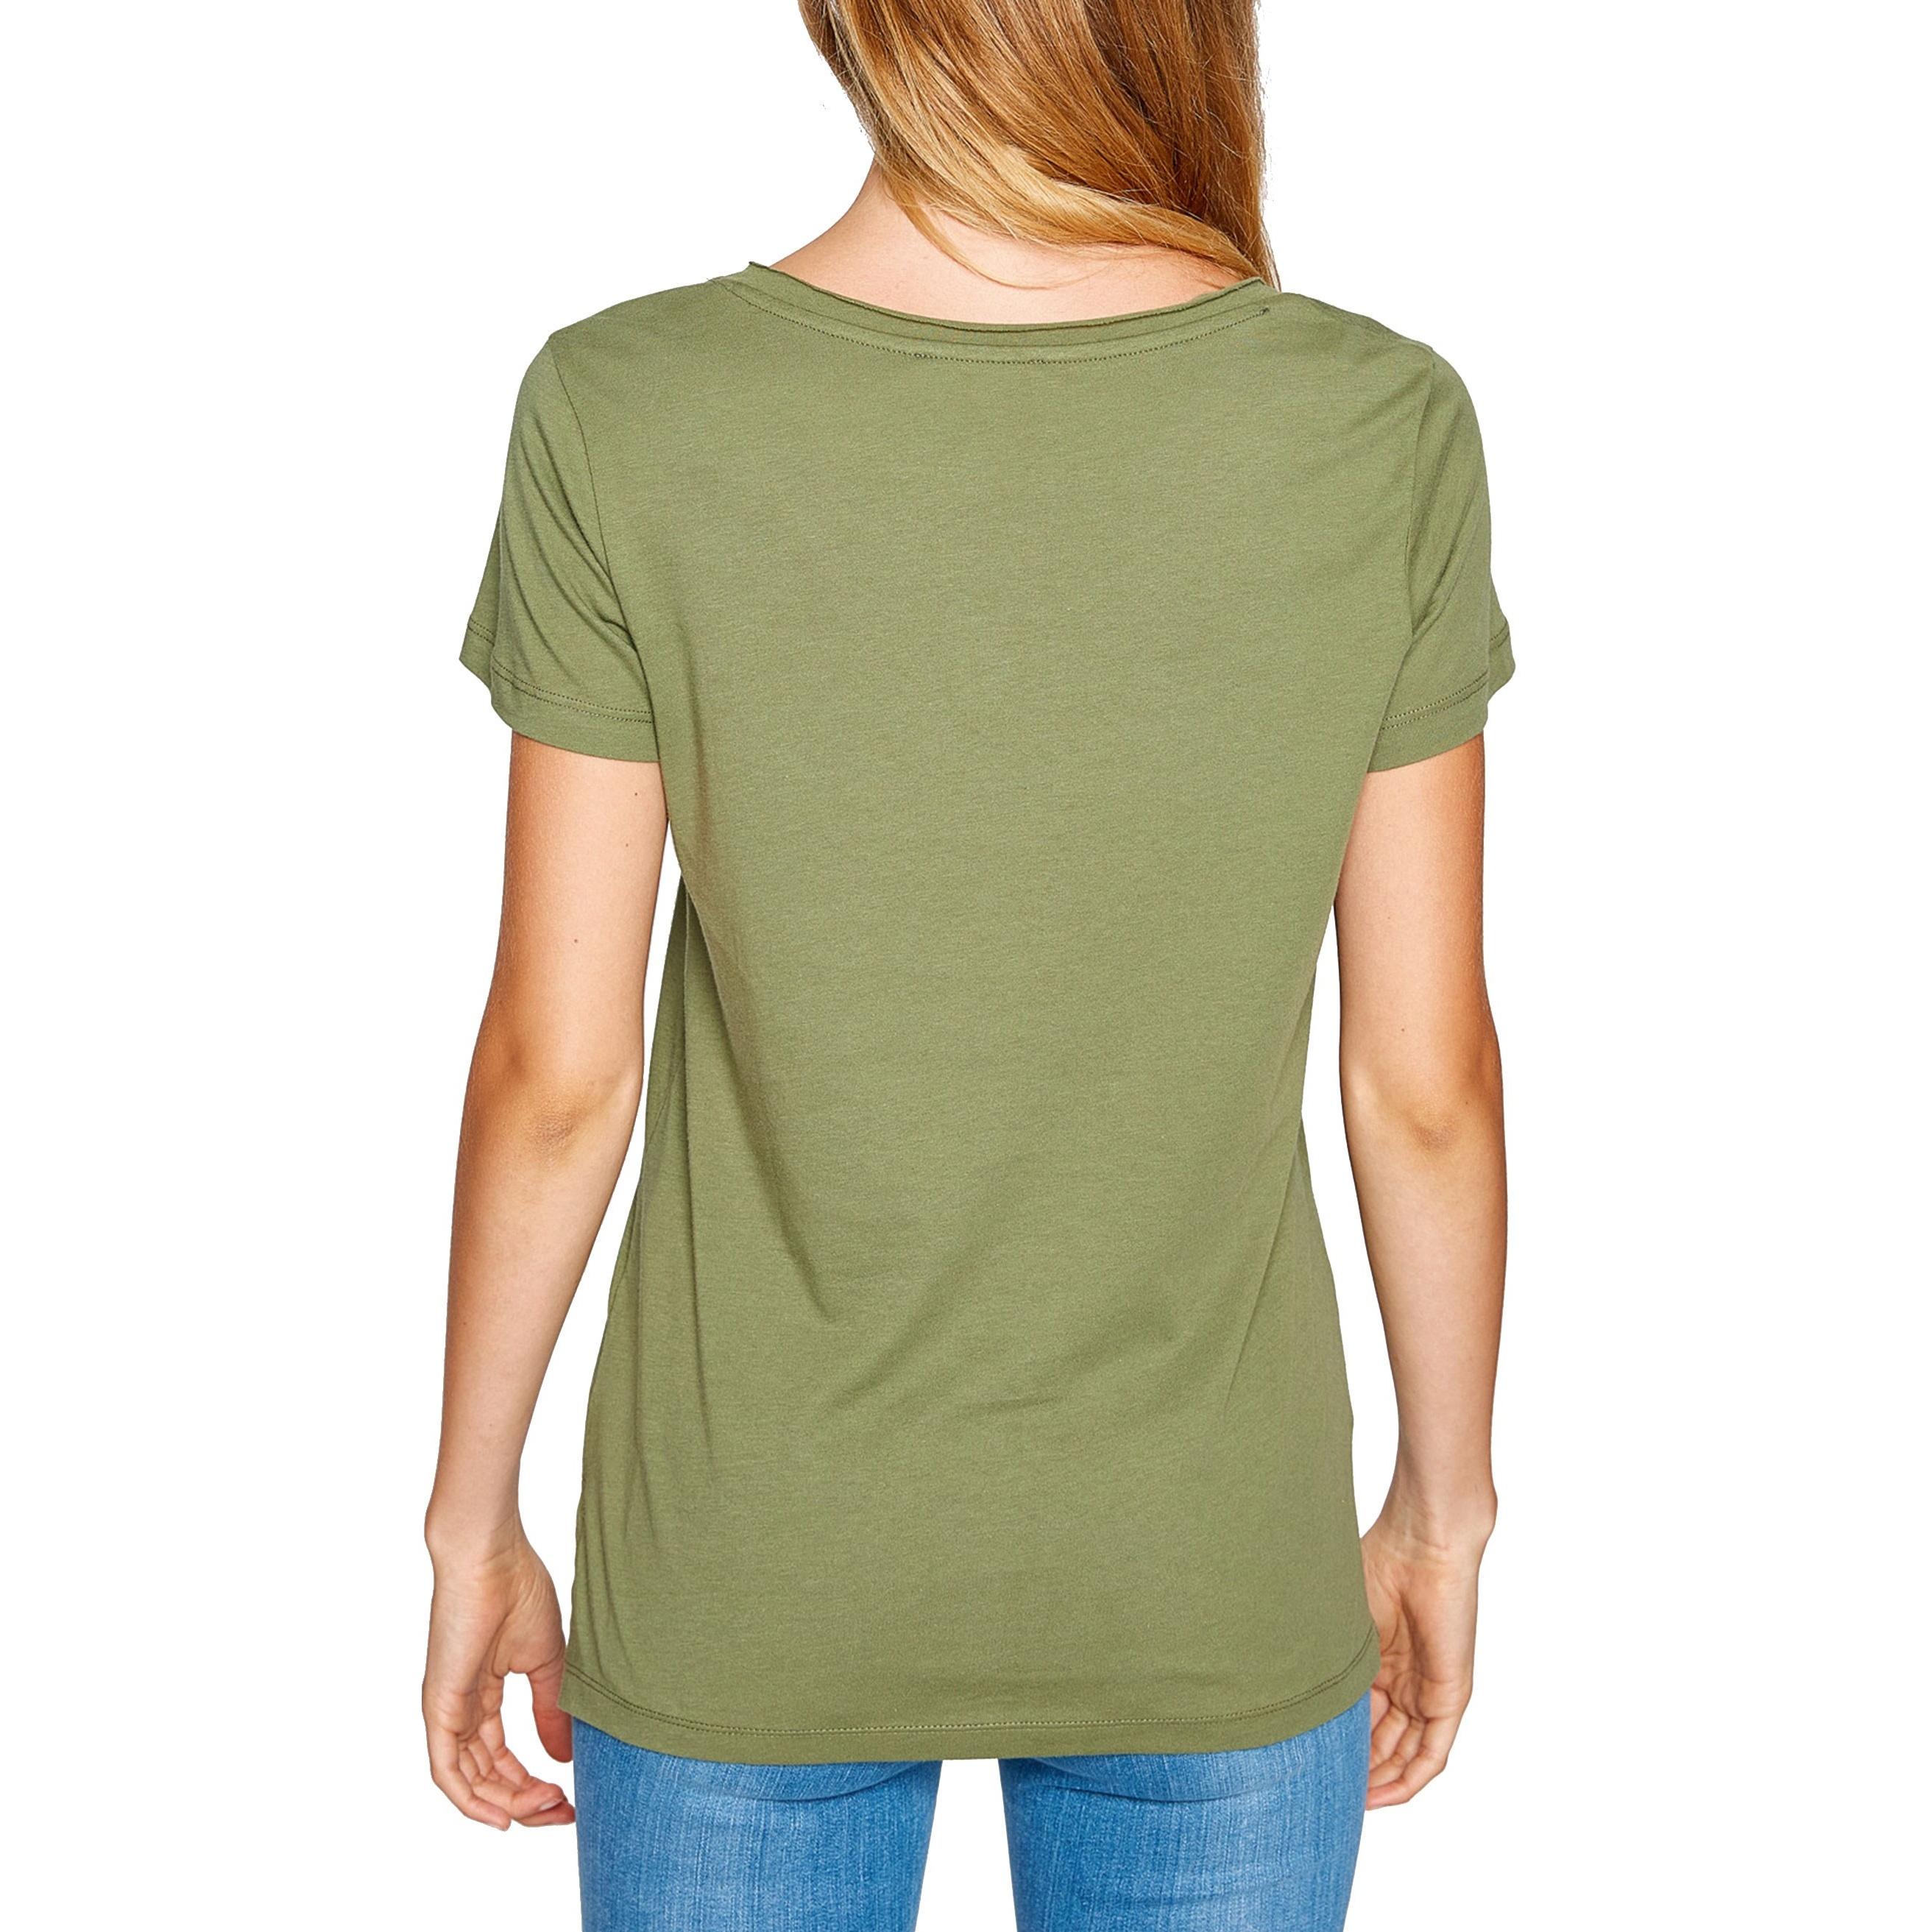 تی شرت نخی یقه هفت زنانه - کوتون - سدري - 2